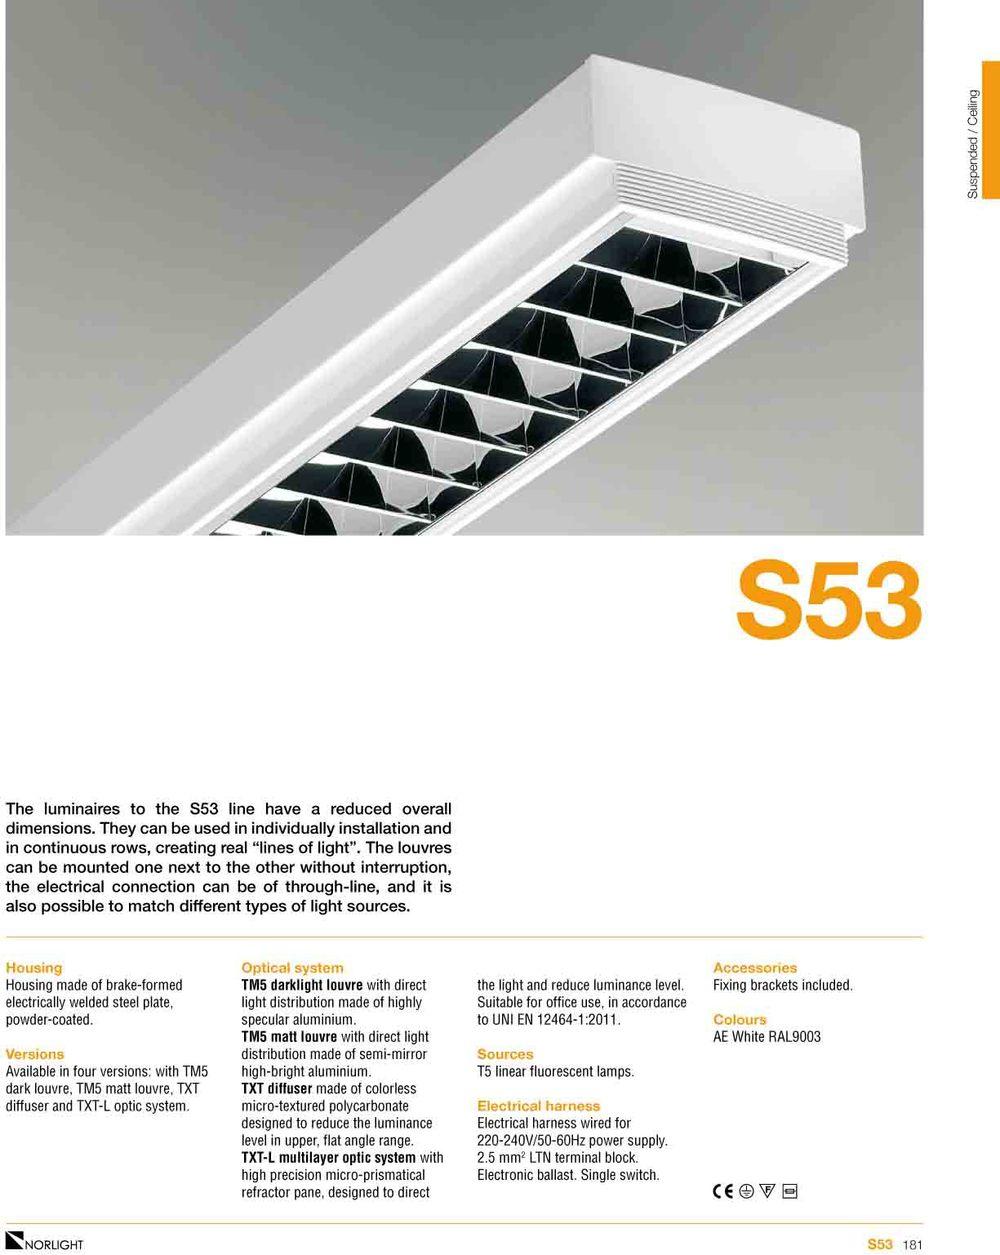 105_Norlight_Catalogue_2012_S53-182.jpg